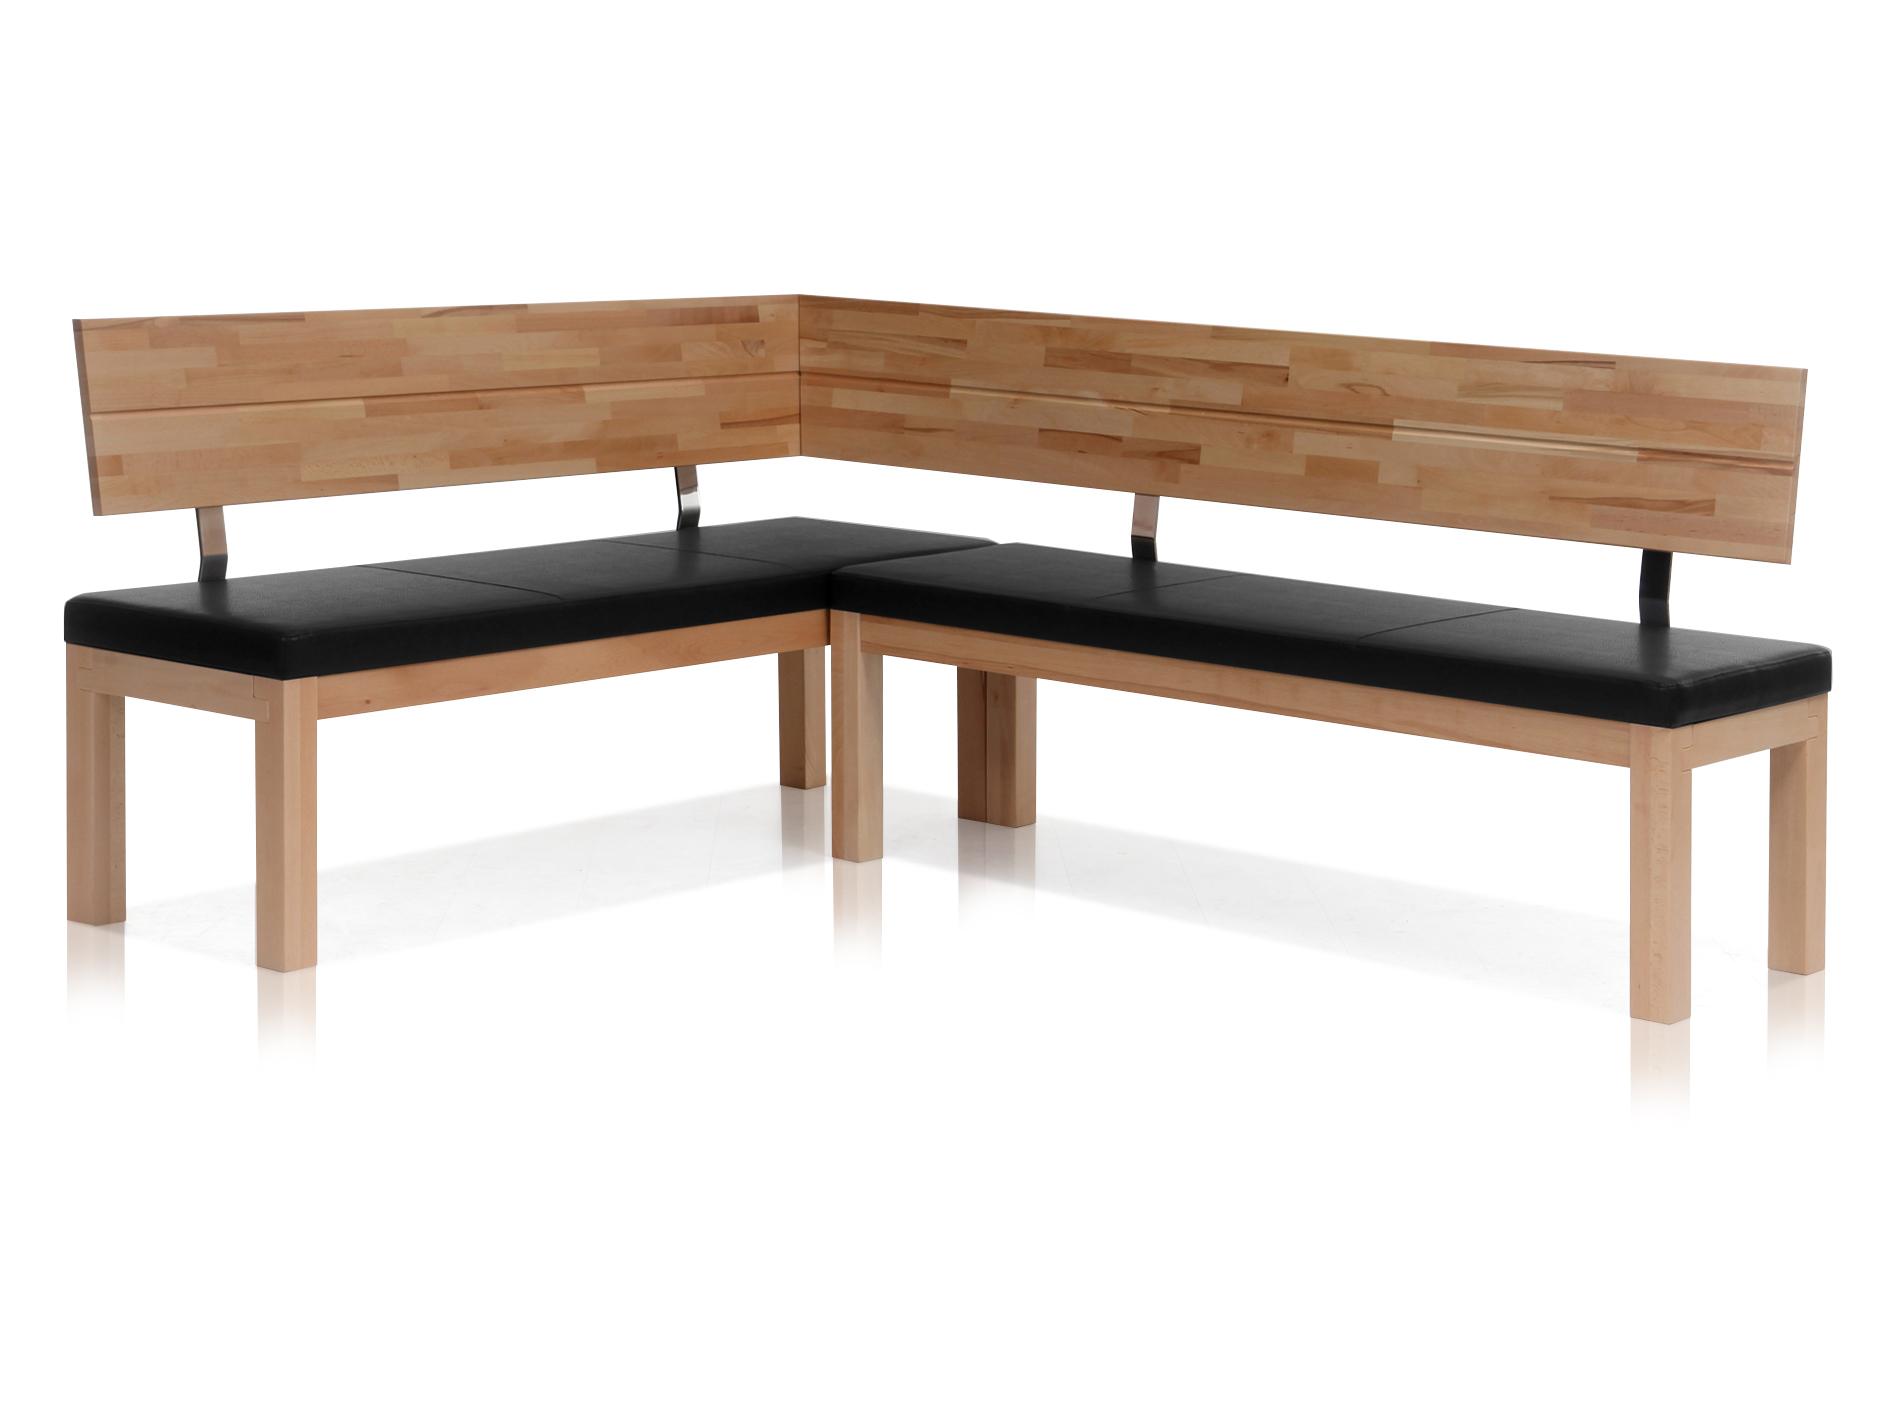 salima eckbank massivholz mit kunstleder bezogen 190 x 150 cm links kernbuche lackiert schwarz. Black Bedroom Furniture Sets. Home Design Ideas